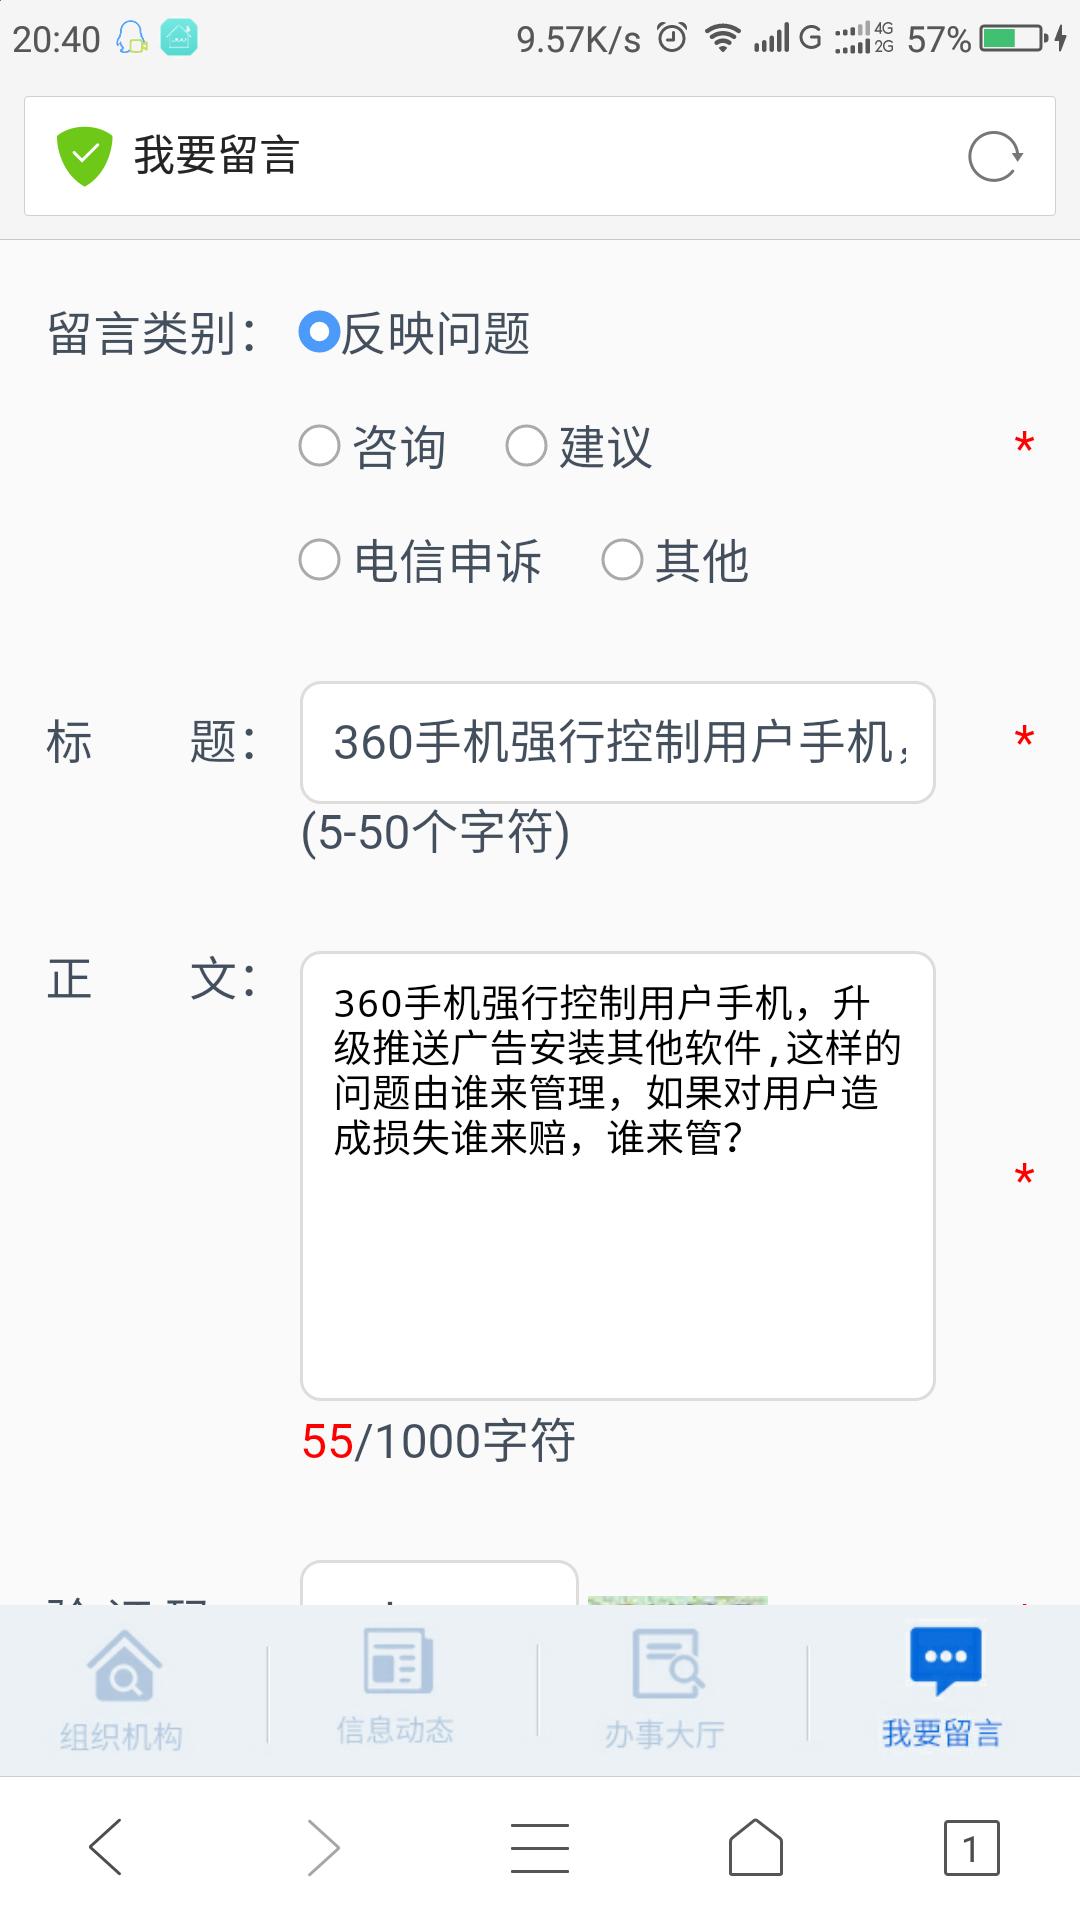 Screenshot_2017-11-08-20-40-05.png